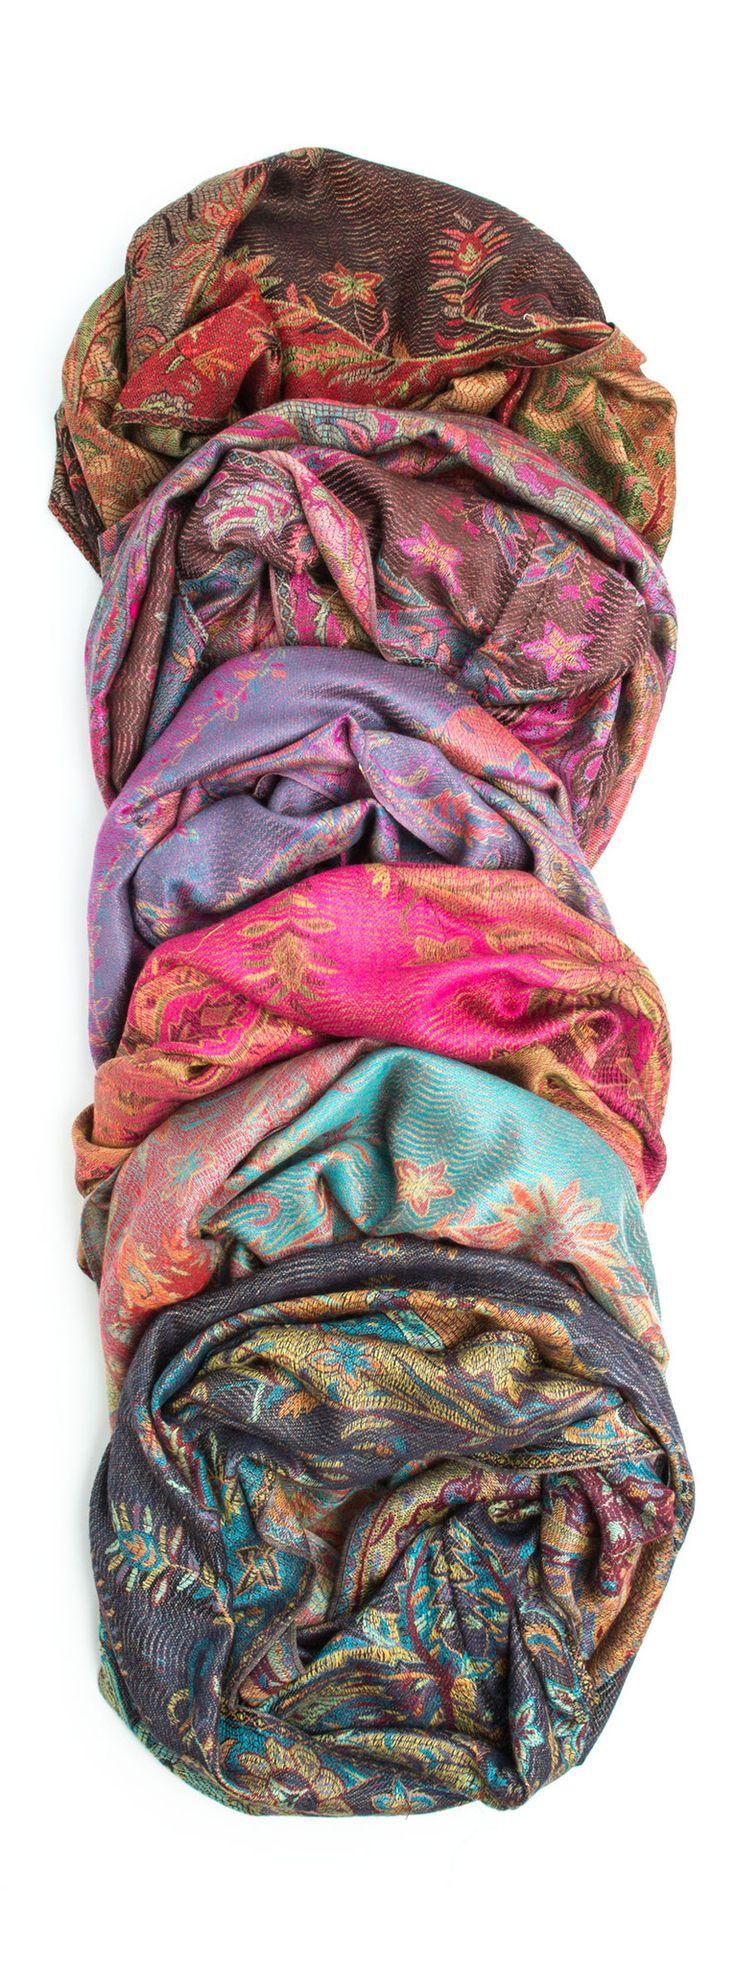 Ramaya Infinity Scarf - Richly Colored Rare Infinity Pashmina Scarf